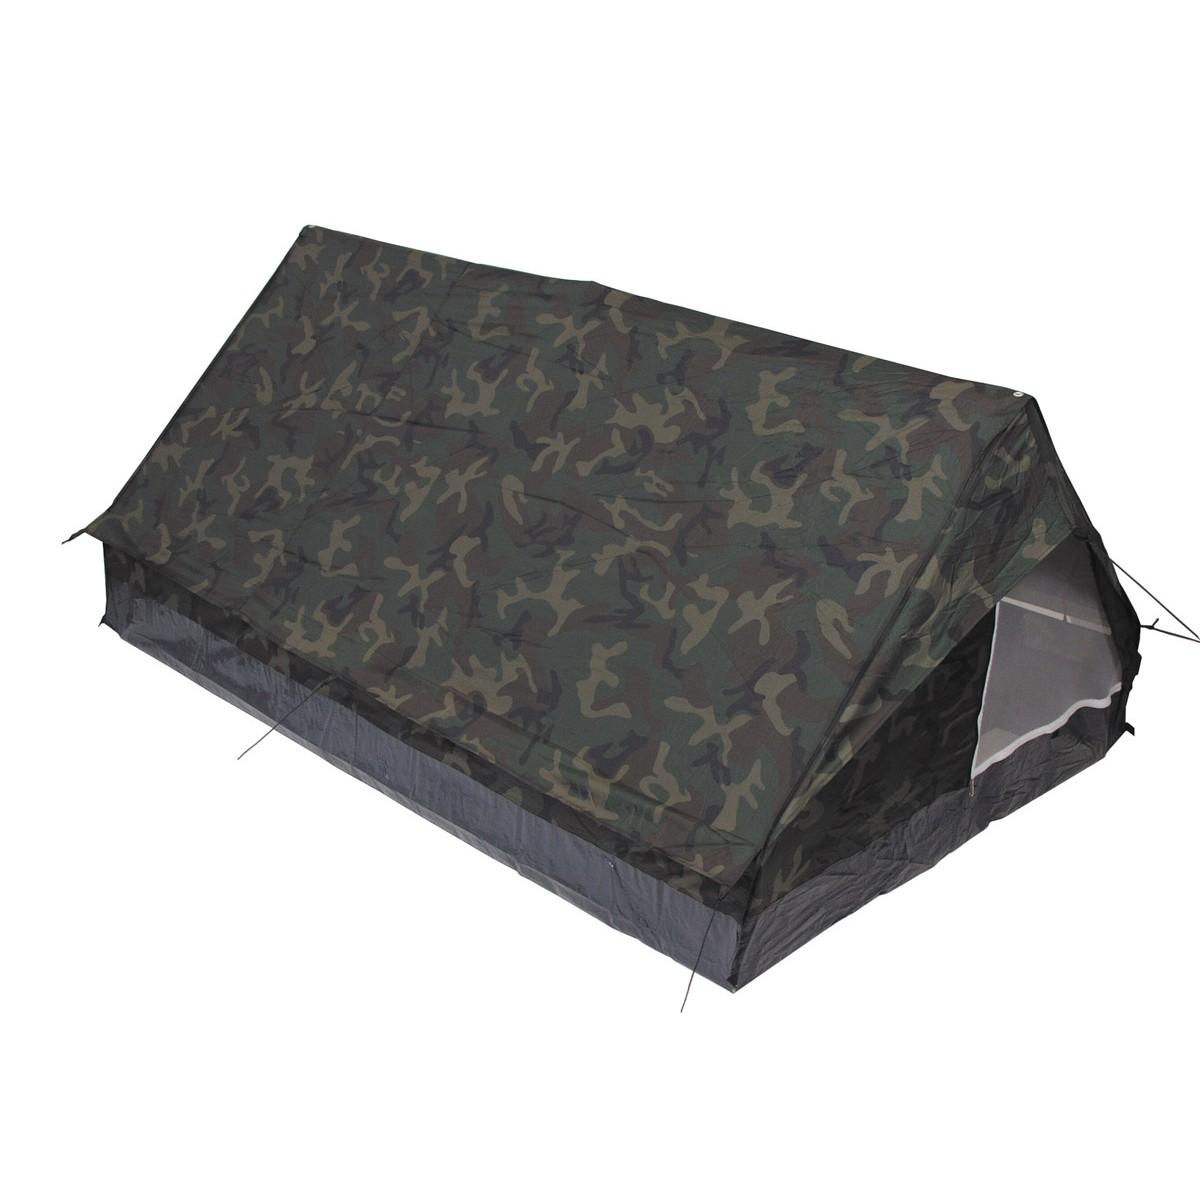 Šator Minipack za 2 osobe